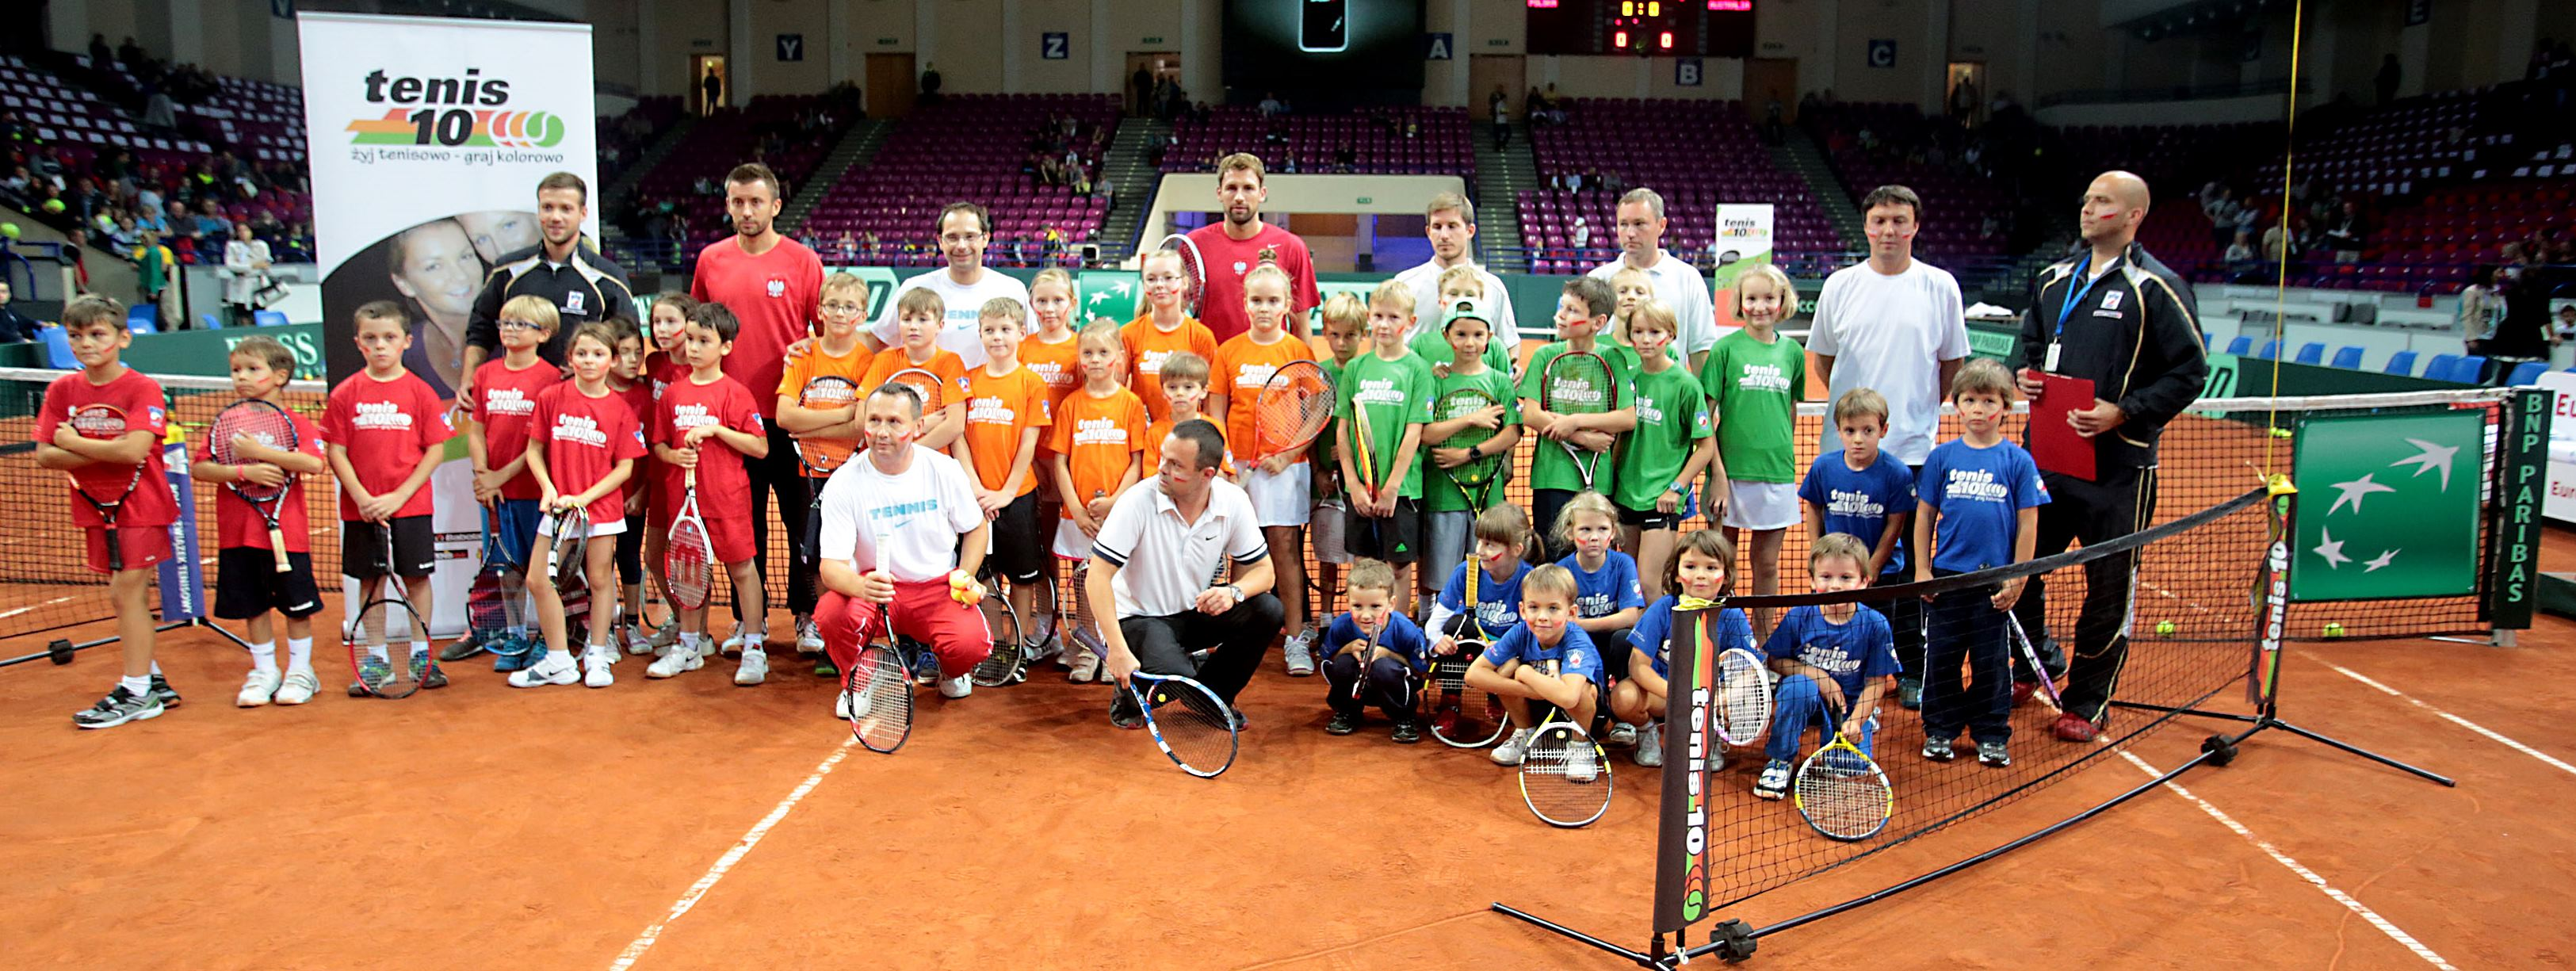 "Dzieci z KS 'Tennis Life"" zaproszone na Puchar Davisa!"